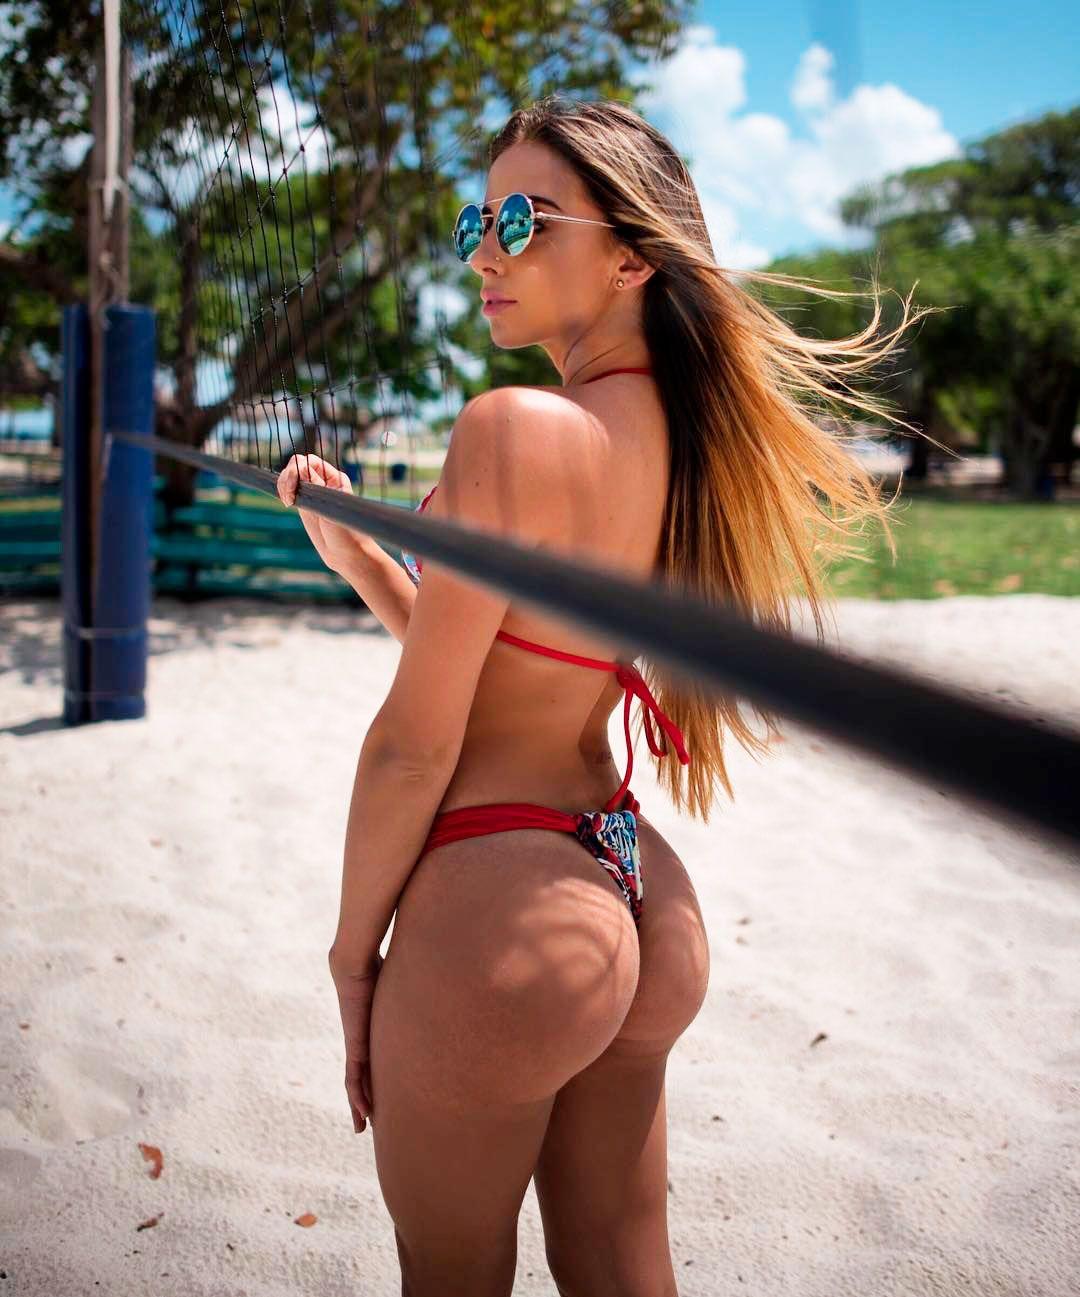 Hacked Bruna Rangel Lima nude (13 photo), Sexy, Bikini, Feet, swimsuit 2018